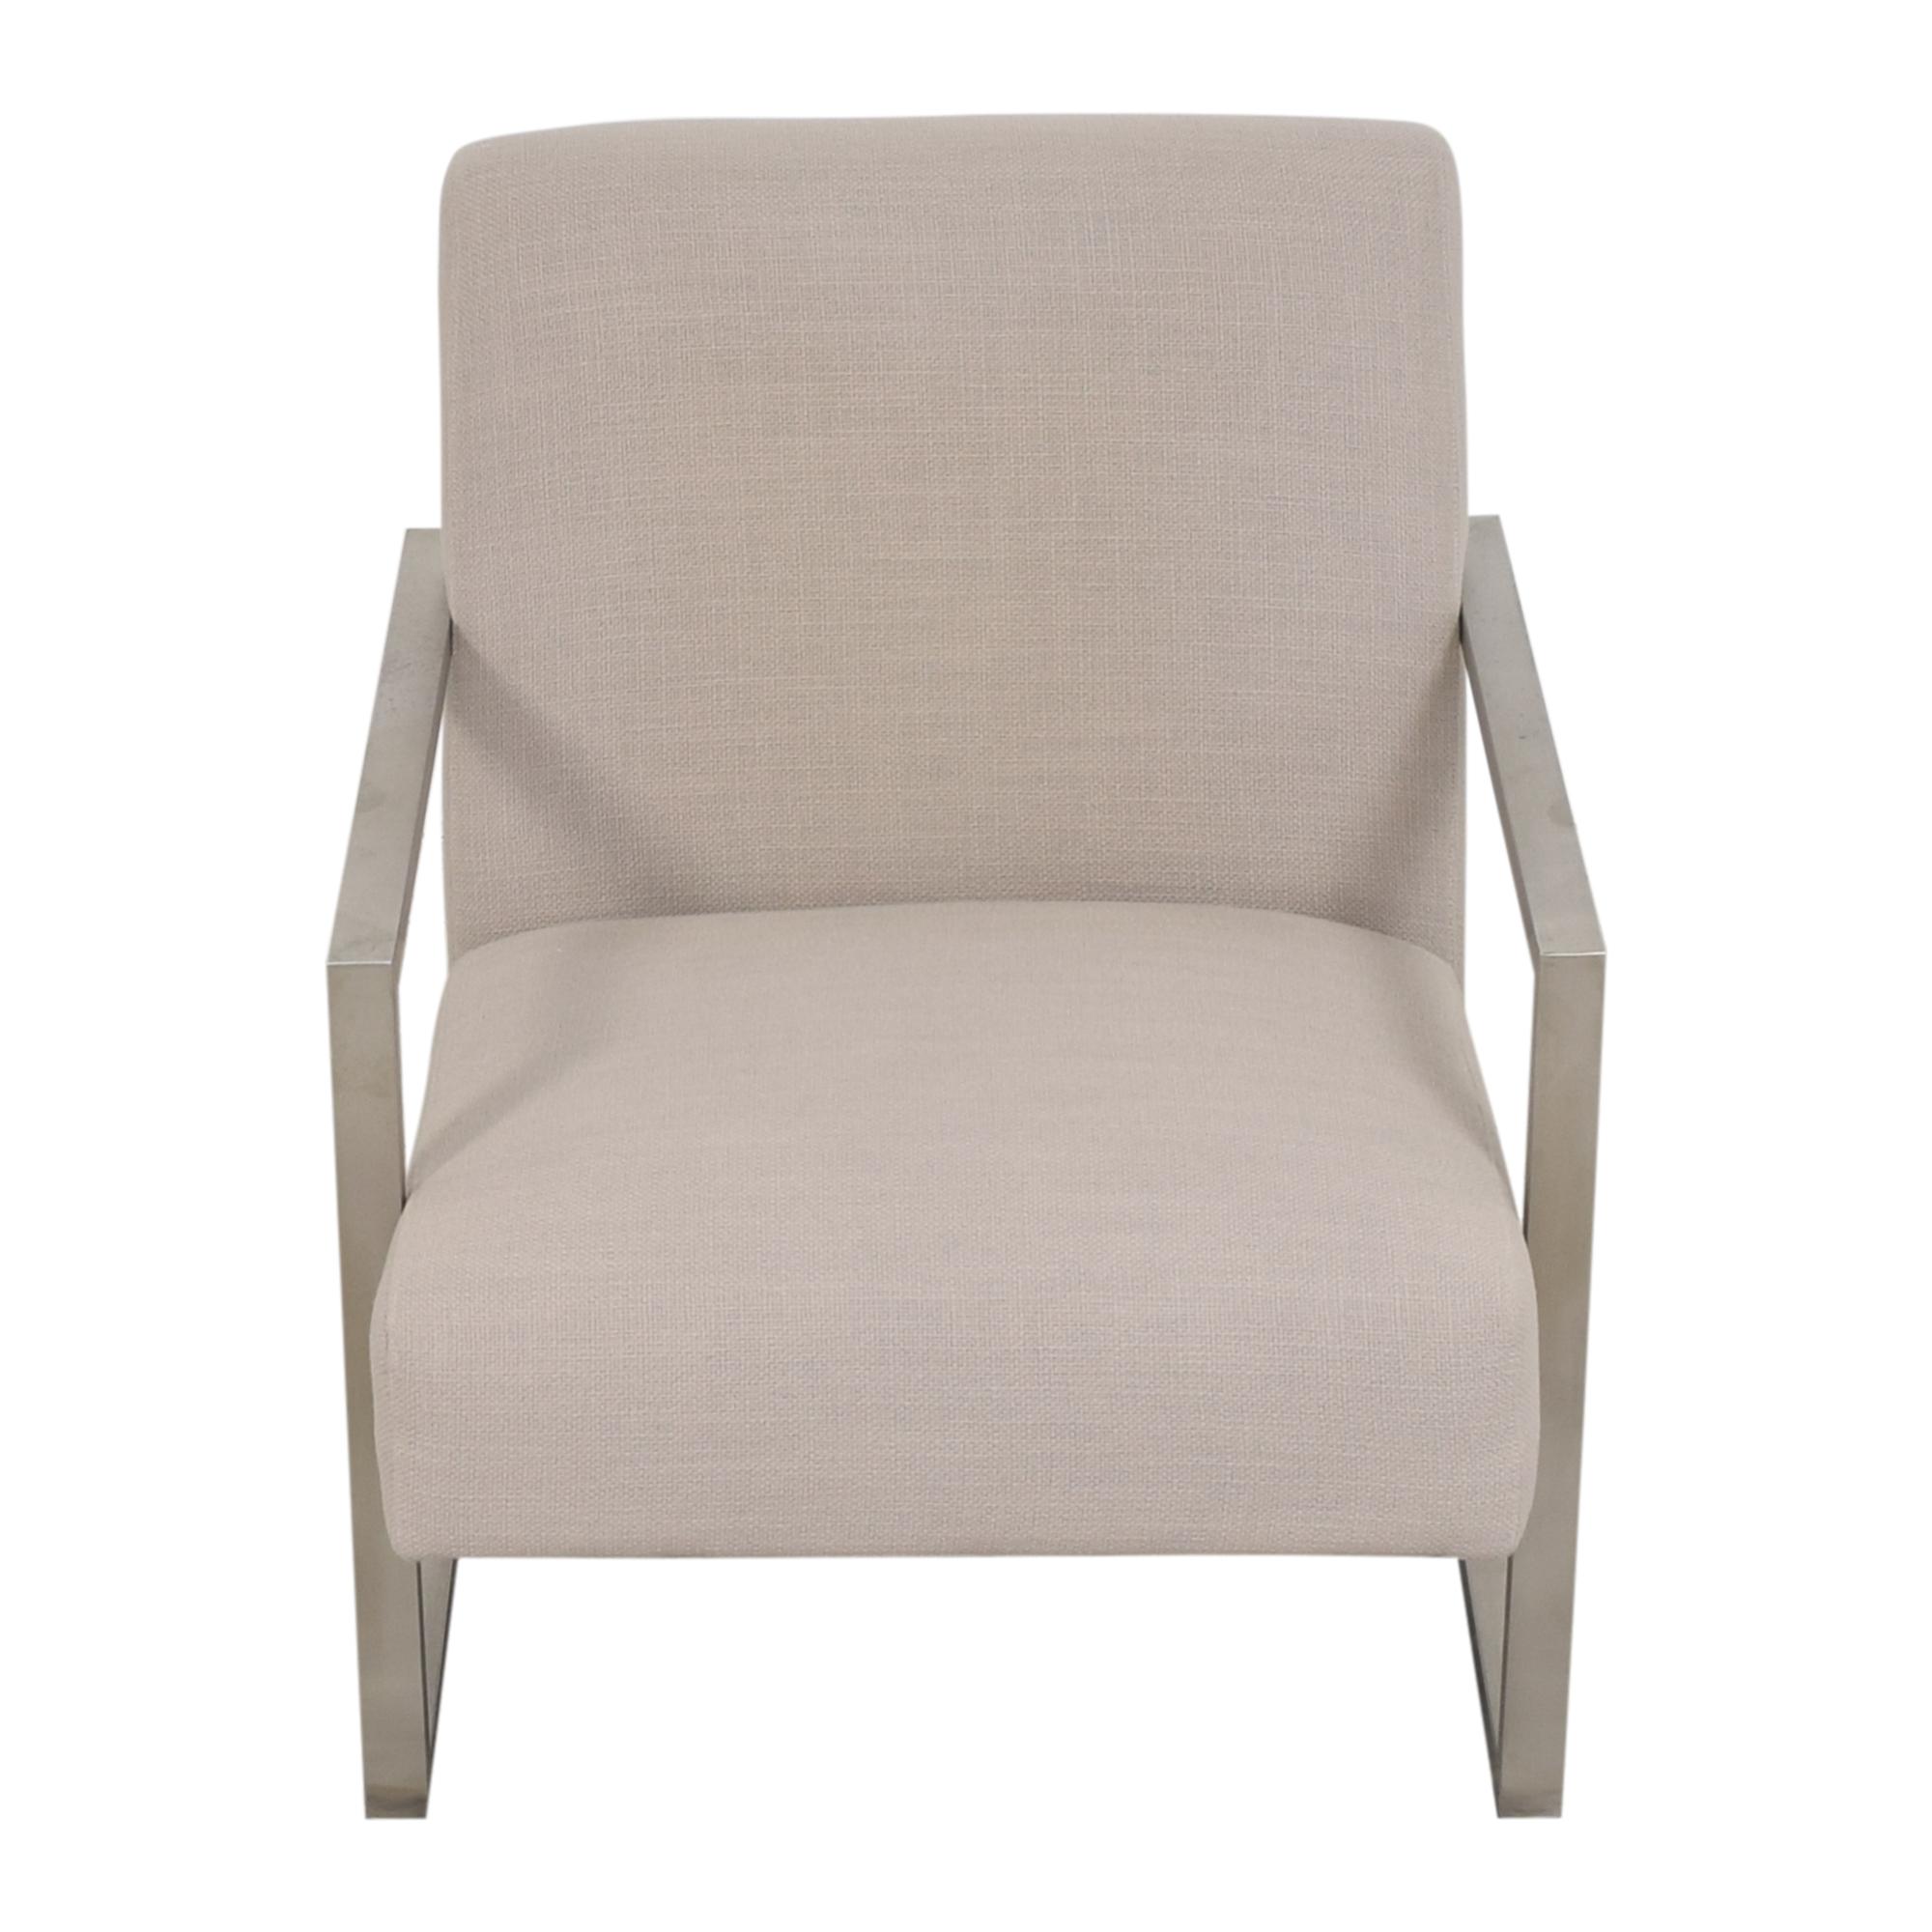 Armen Living Armen Living Skyline Accent Chair pa